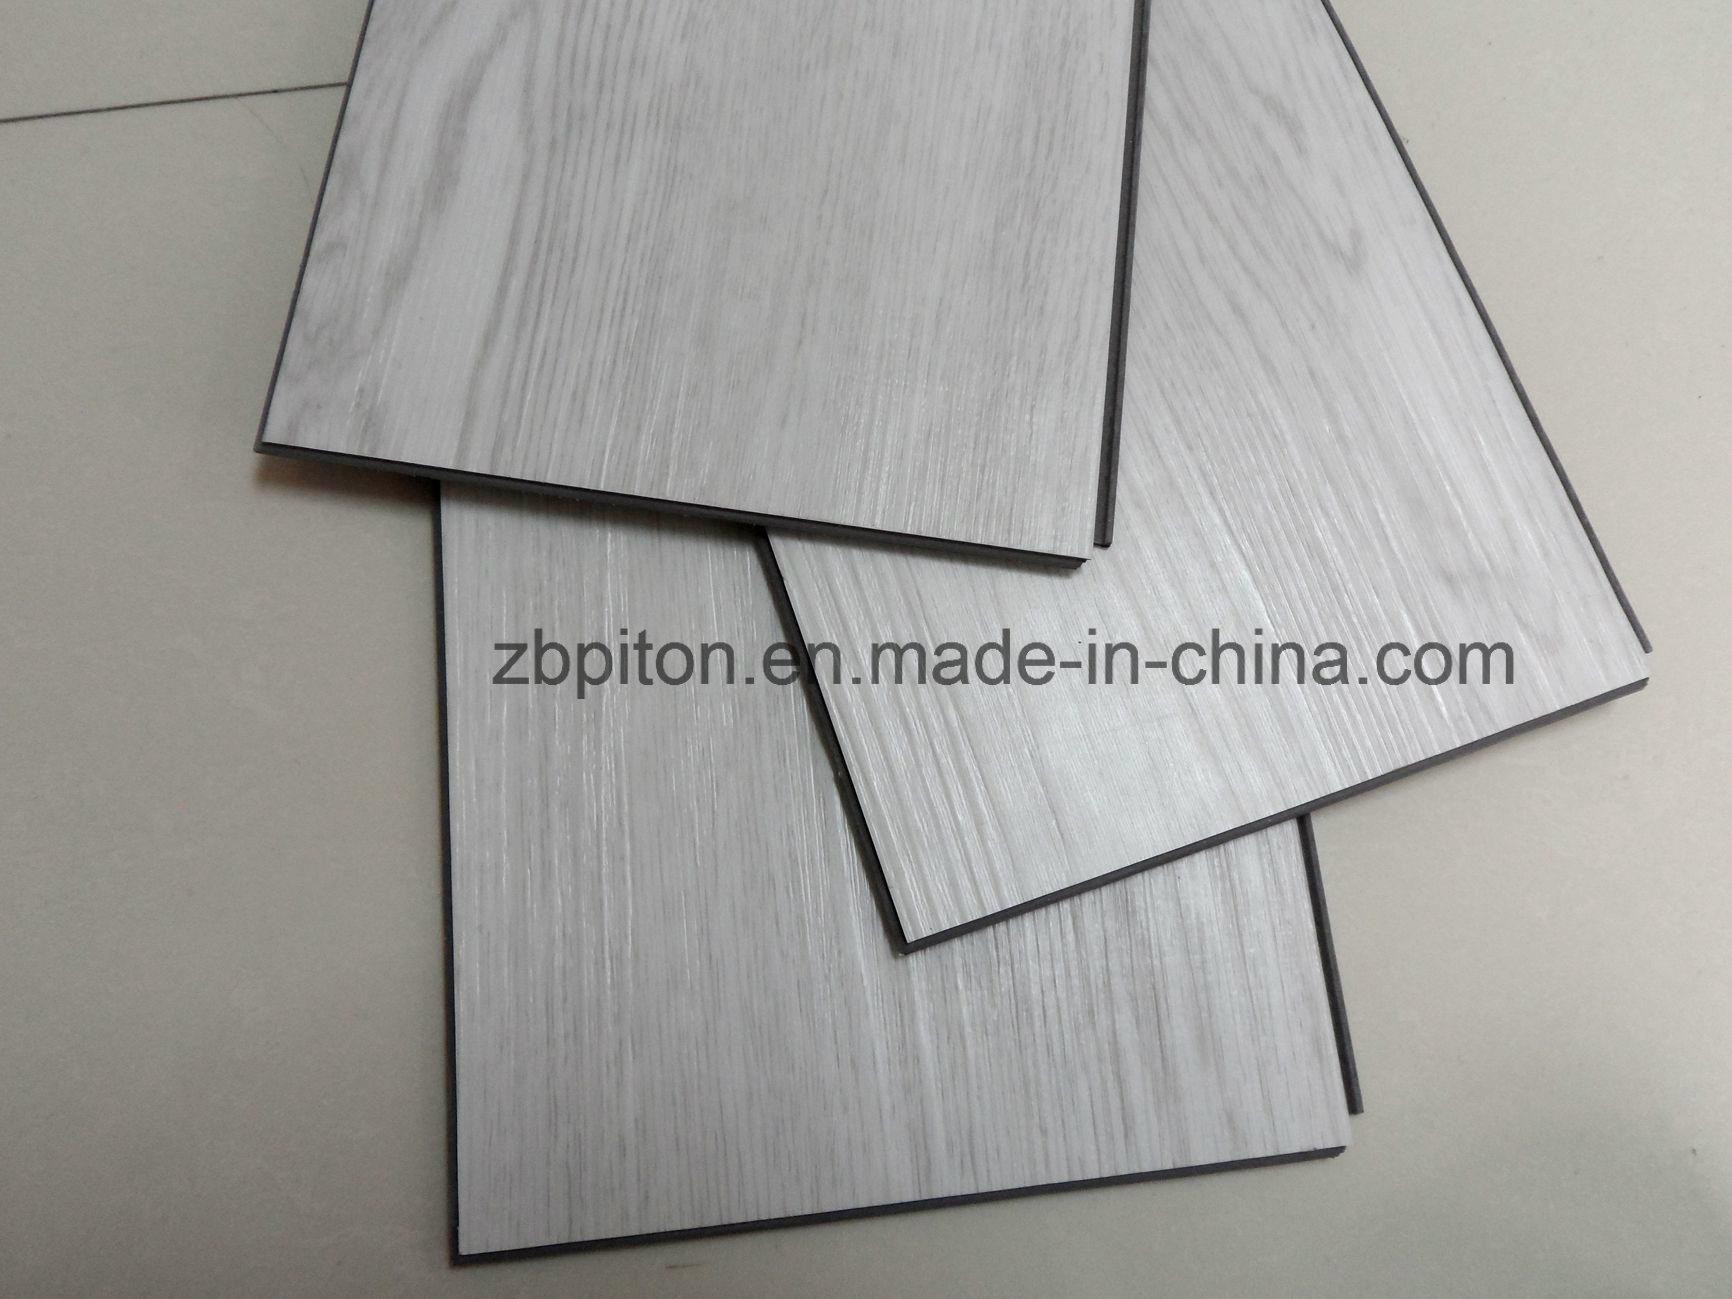 China interlocking plastic floor tile lvt pvc vinyl planks interlocking plastic floor tile lvt pvc vinyl planks cng0471n doublecrazyfo Image collections